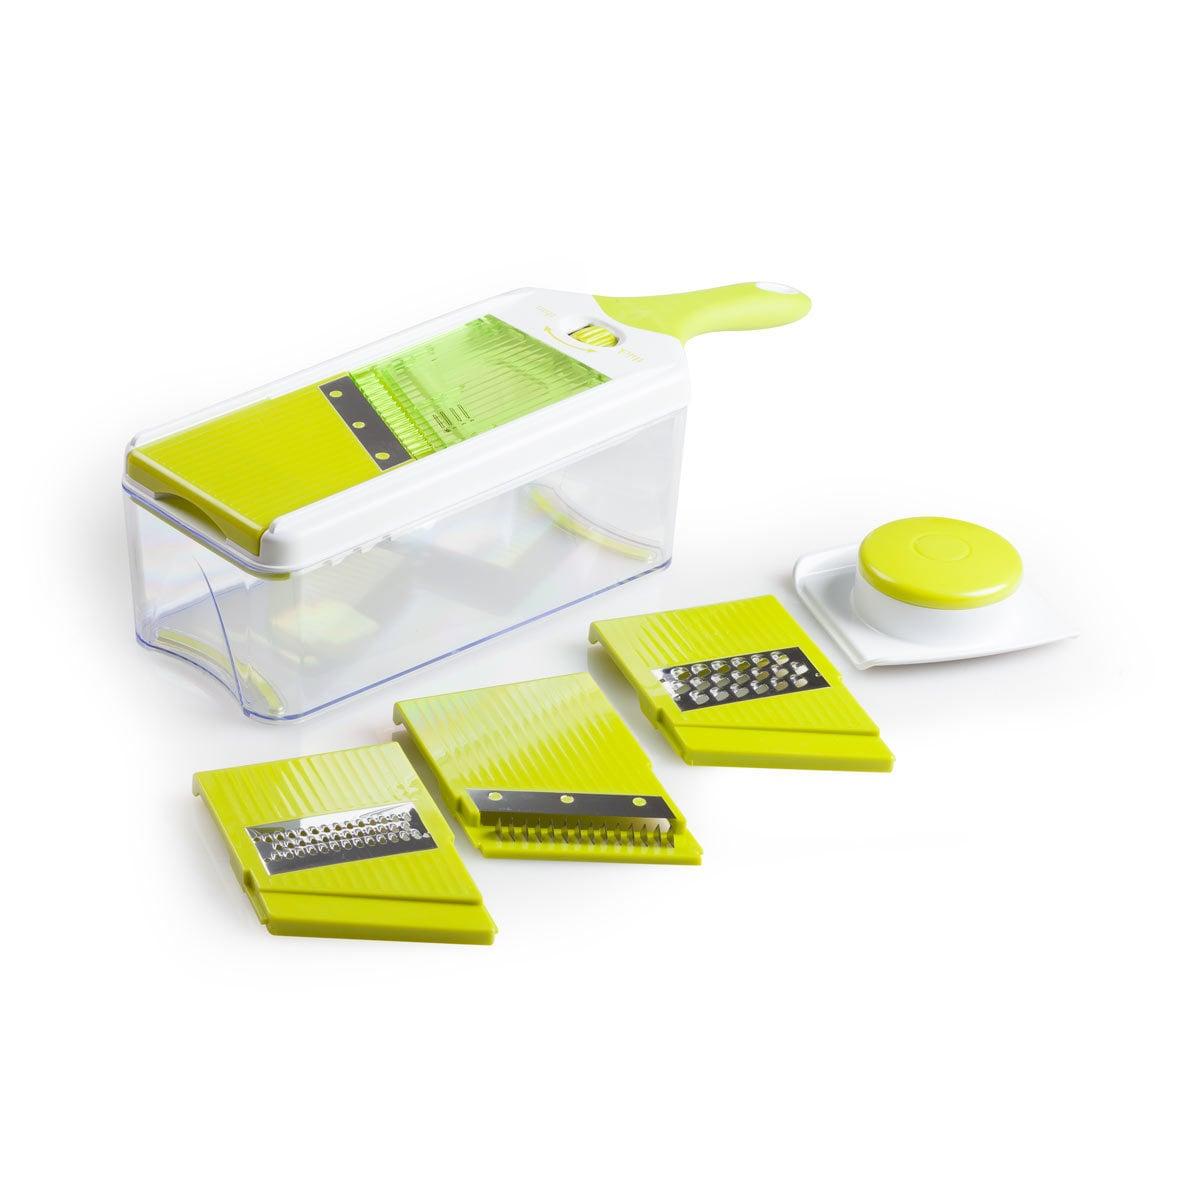 FortheChef Adjustable Mandoline Slicer (4 interchangeable...